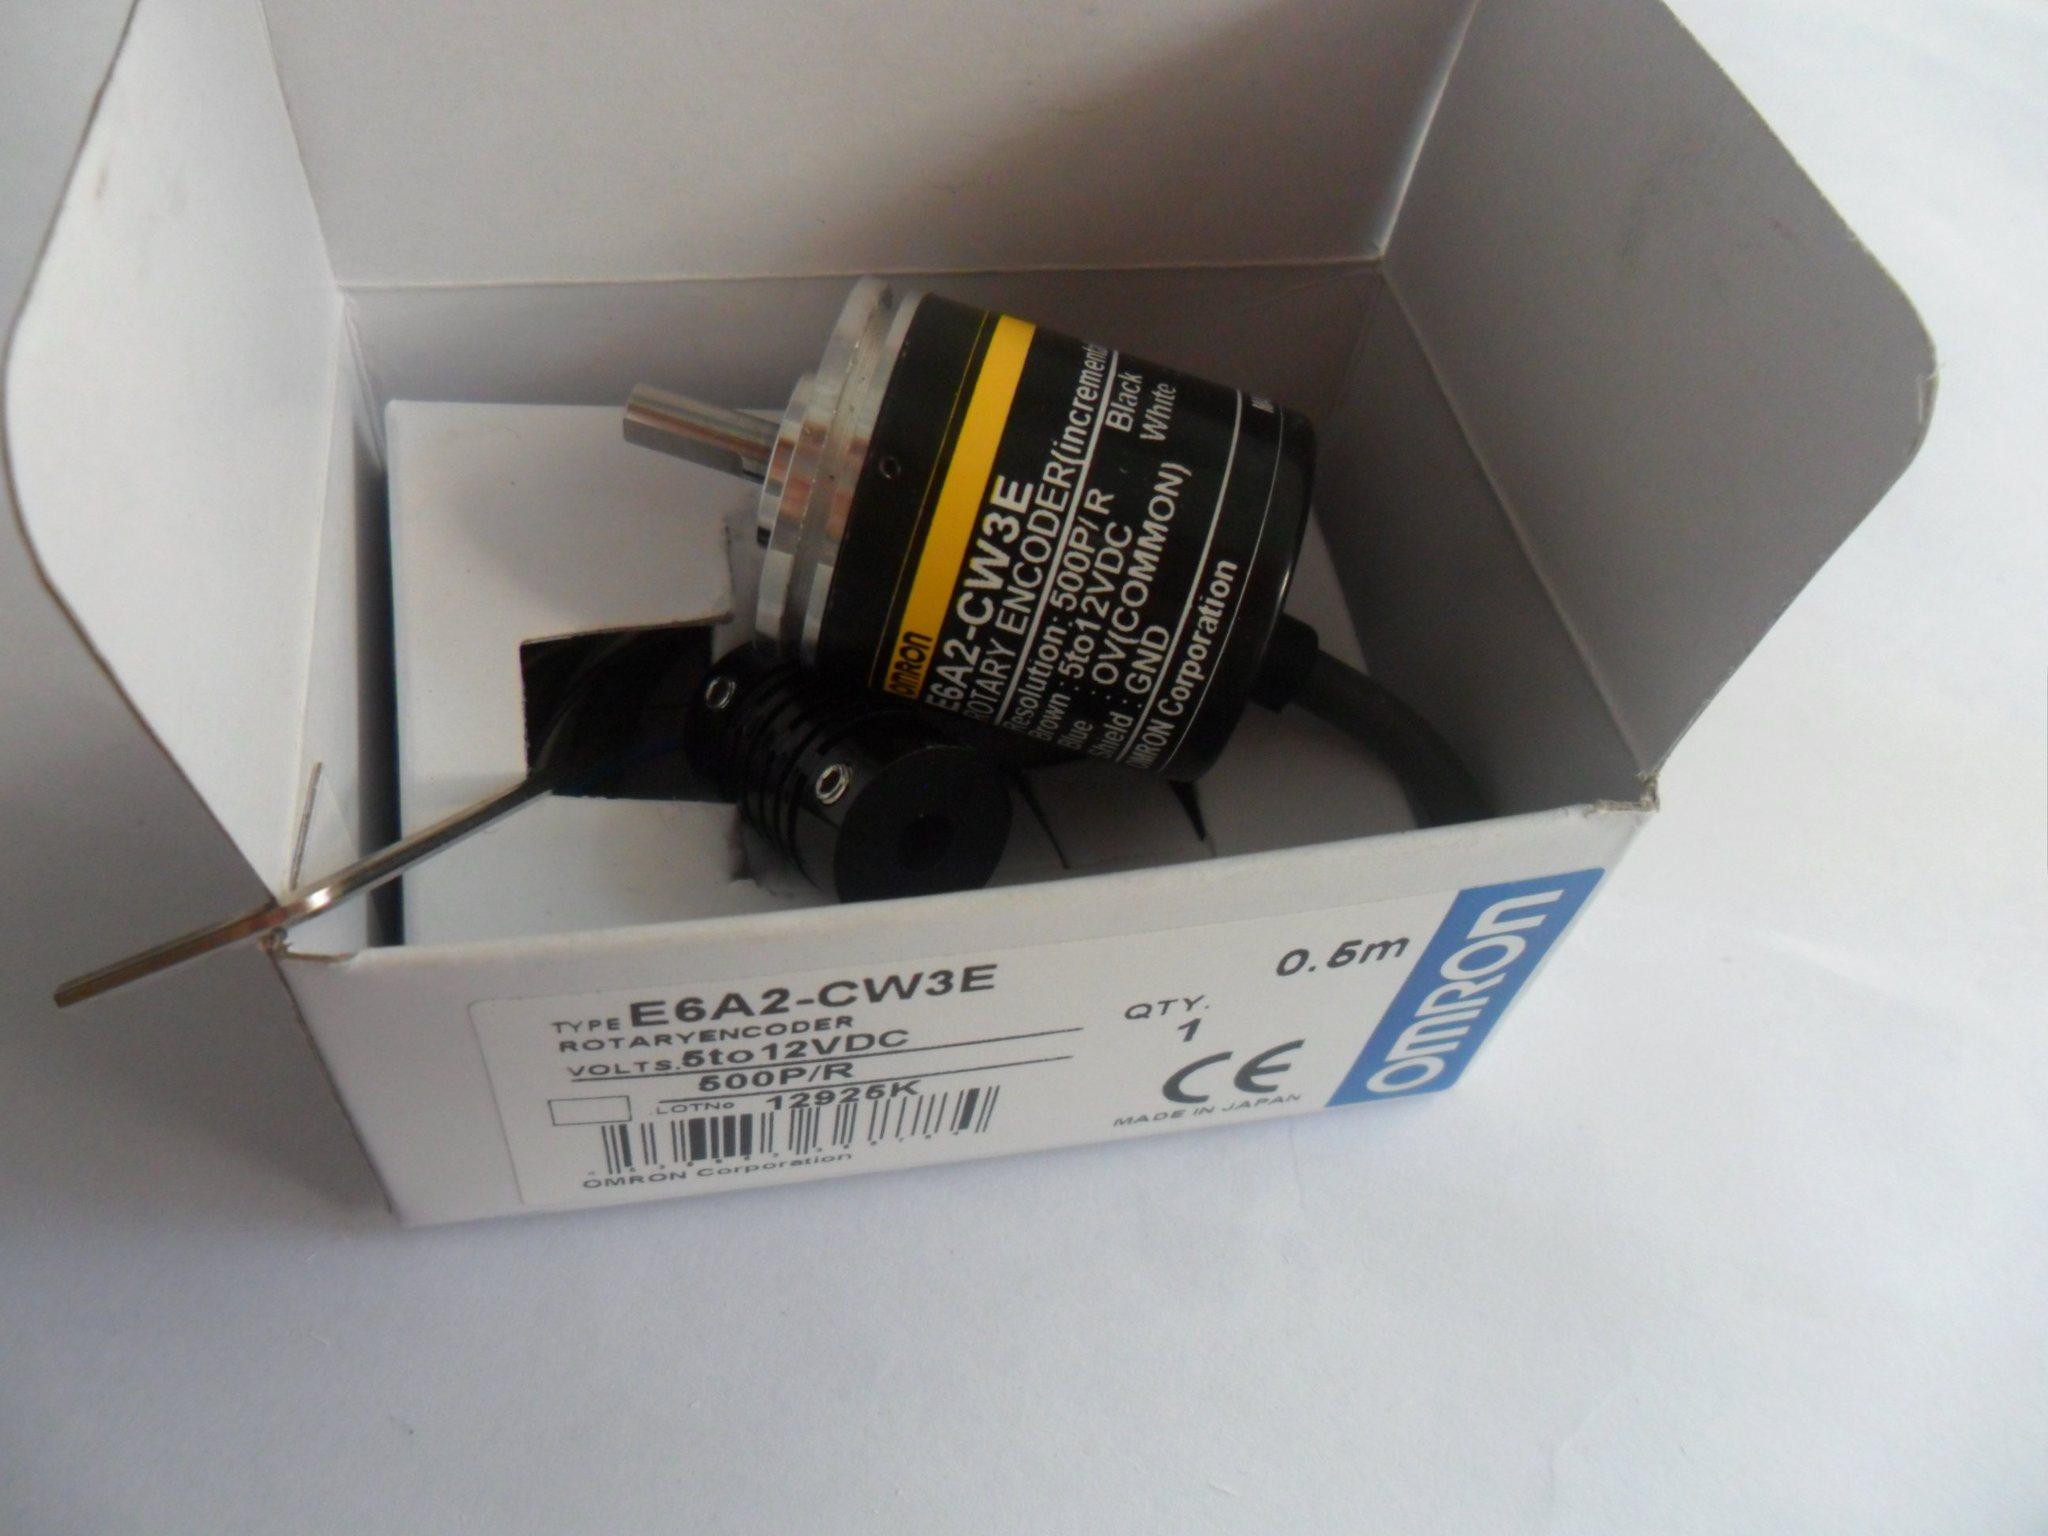 FREE SHIPPING E6a2-cs3e 500p r 0.5m 500 line embroidered machine encoder micro encoderFREE SHIPPING E6a2-cs3e 500p r 0.5m 500 line embroidered machine encoder micro encoder